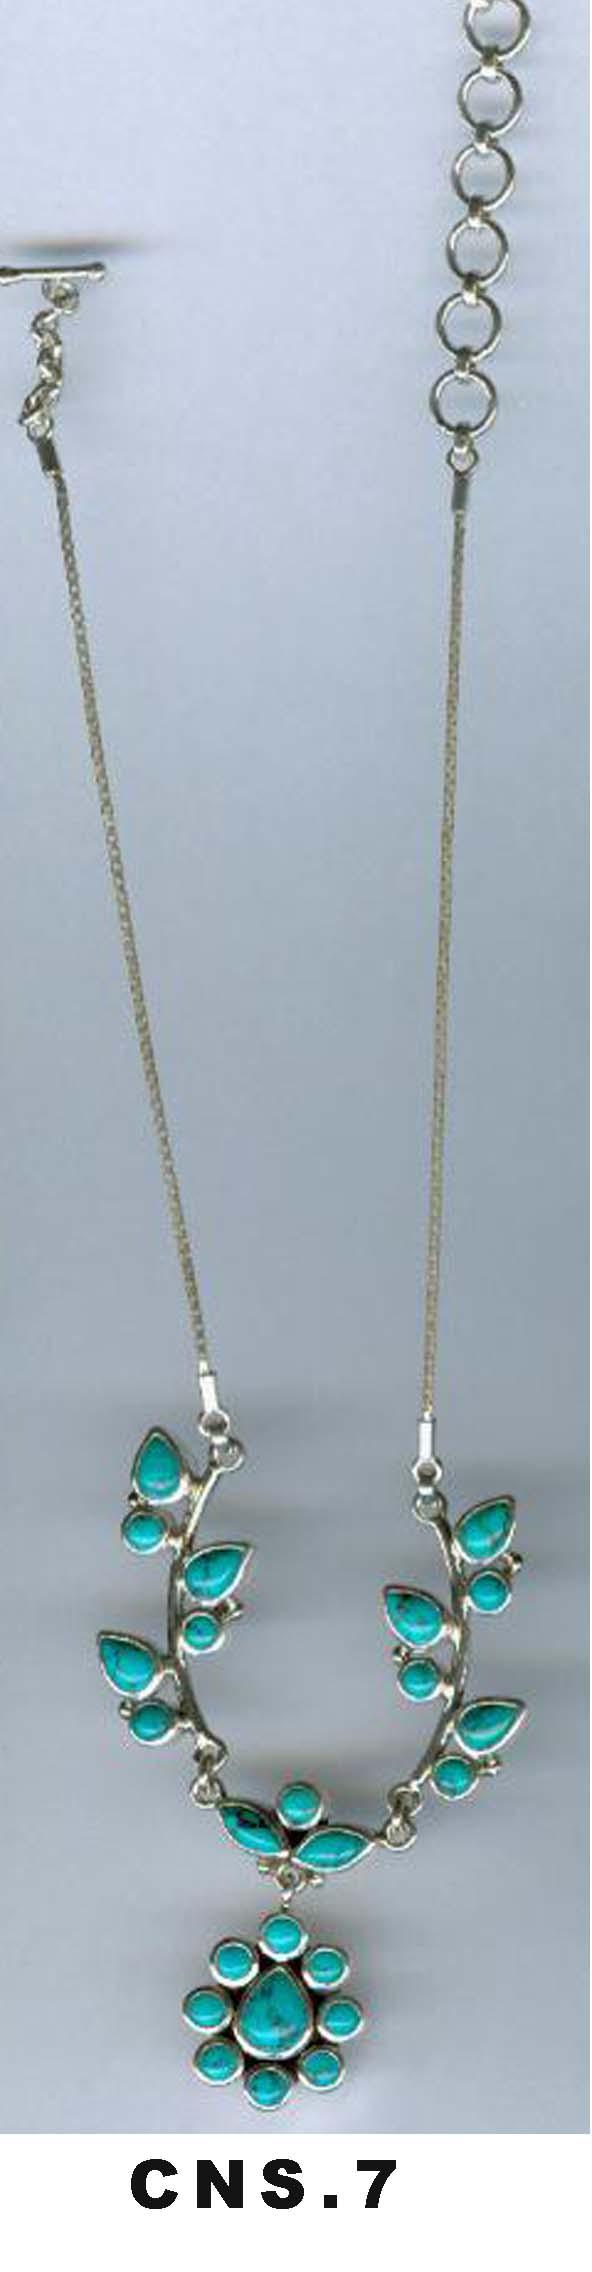 Halskette Stone (Halskette Stone)